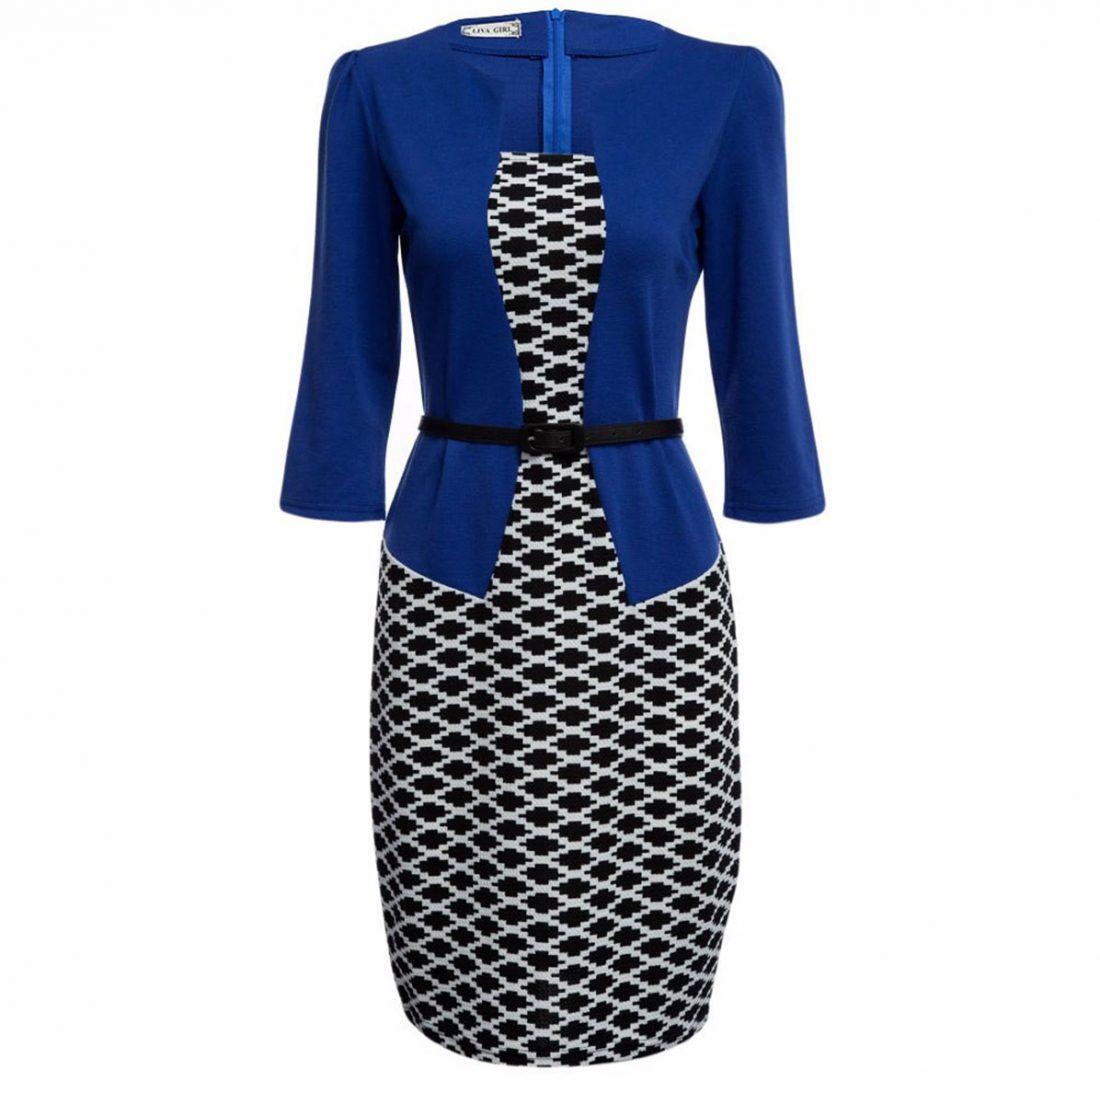 M0187 blueblack1 Office Evening Dresses maureens.com boutique